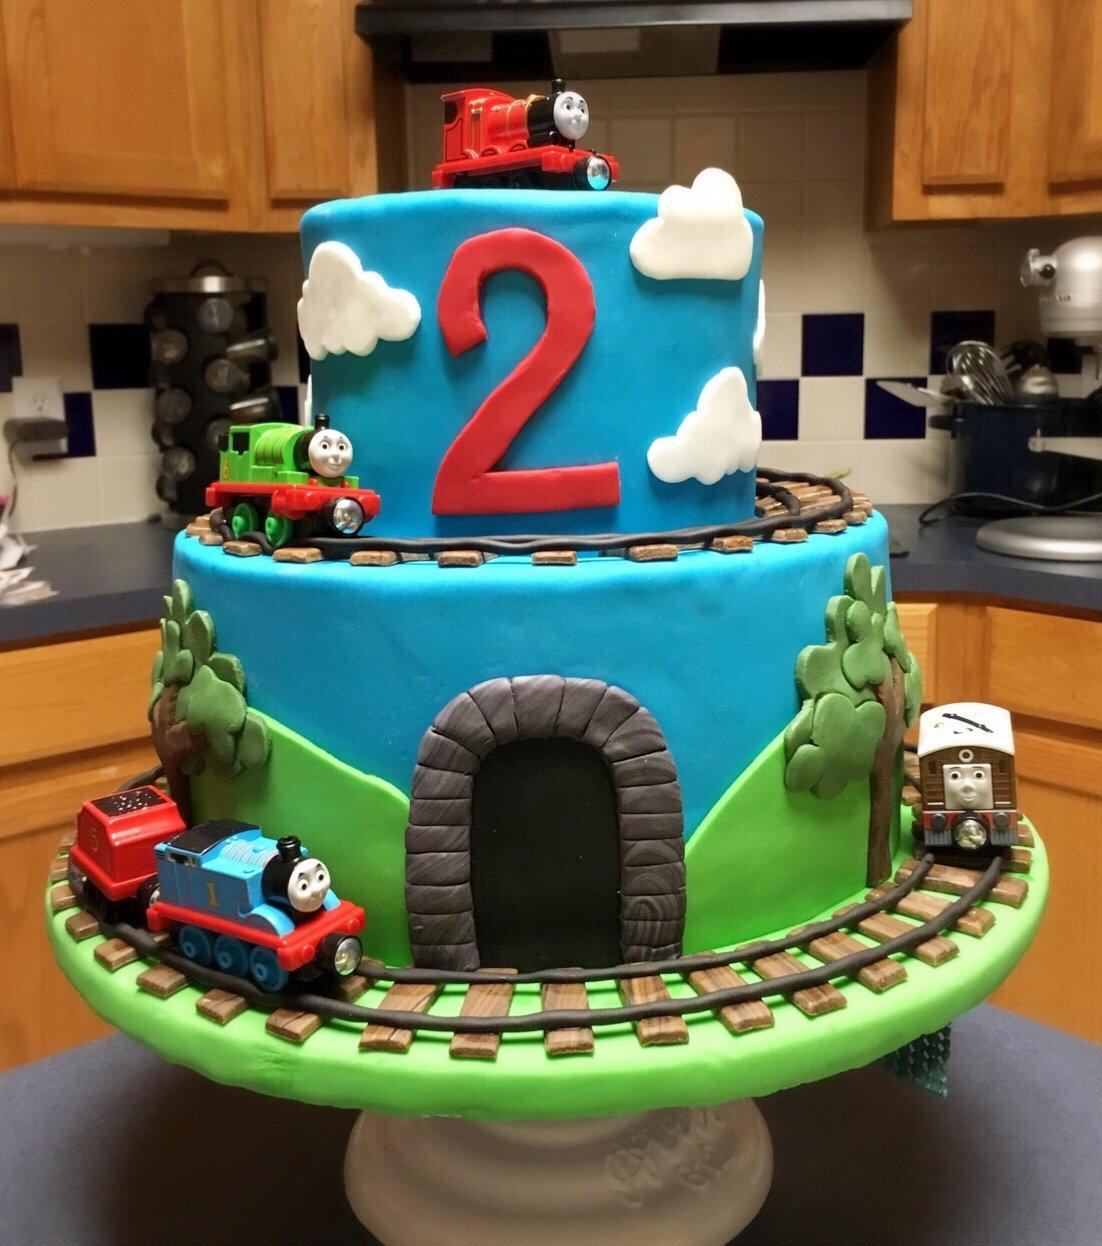 10 Amazing Thomas The Train Cakes Ideas thomas the train cake noah pinterest cake birthdays and 1 2021